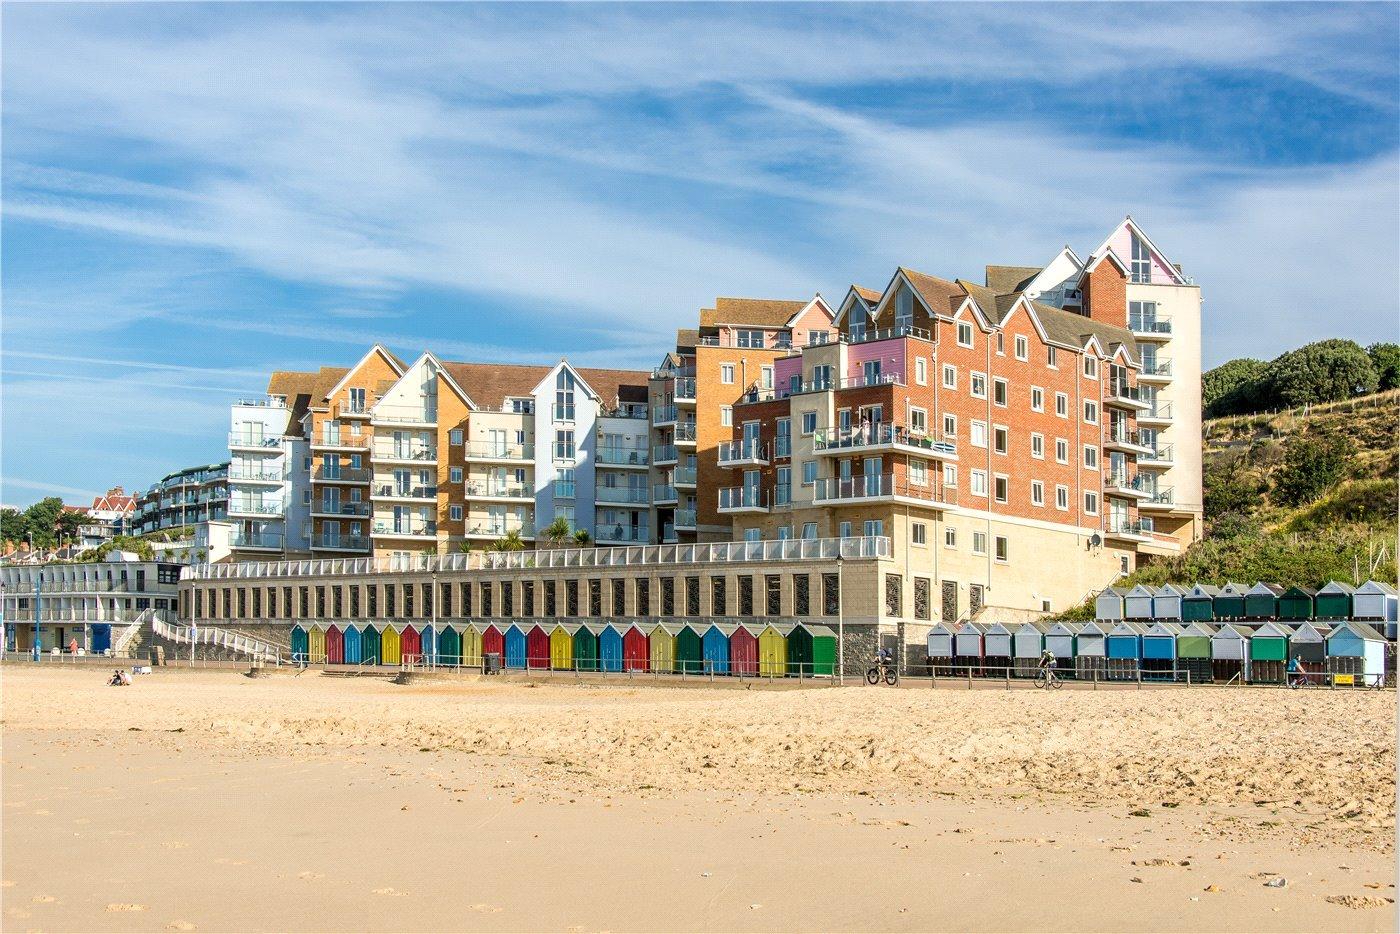 2 Bedroom Property To Rent In Honeycombe Beach Boscombe Spa Boscombe